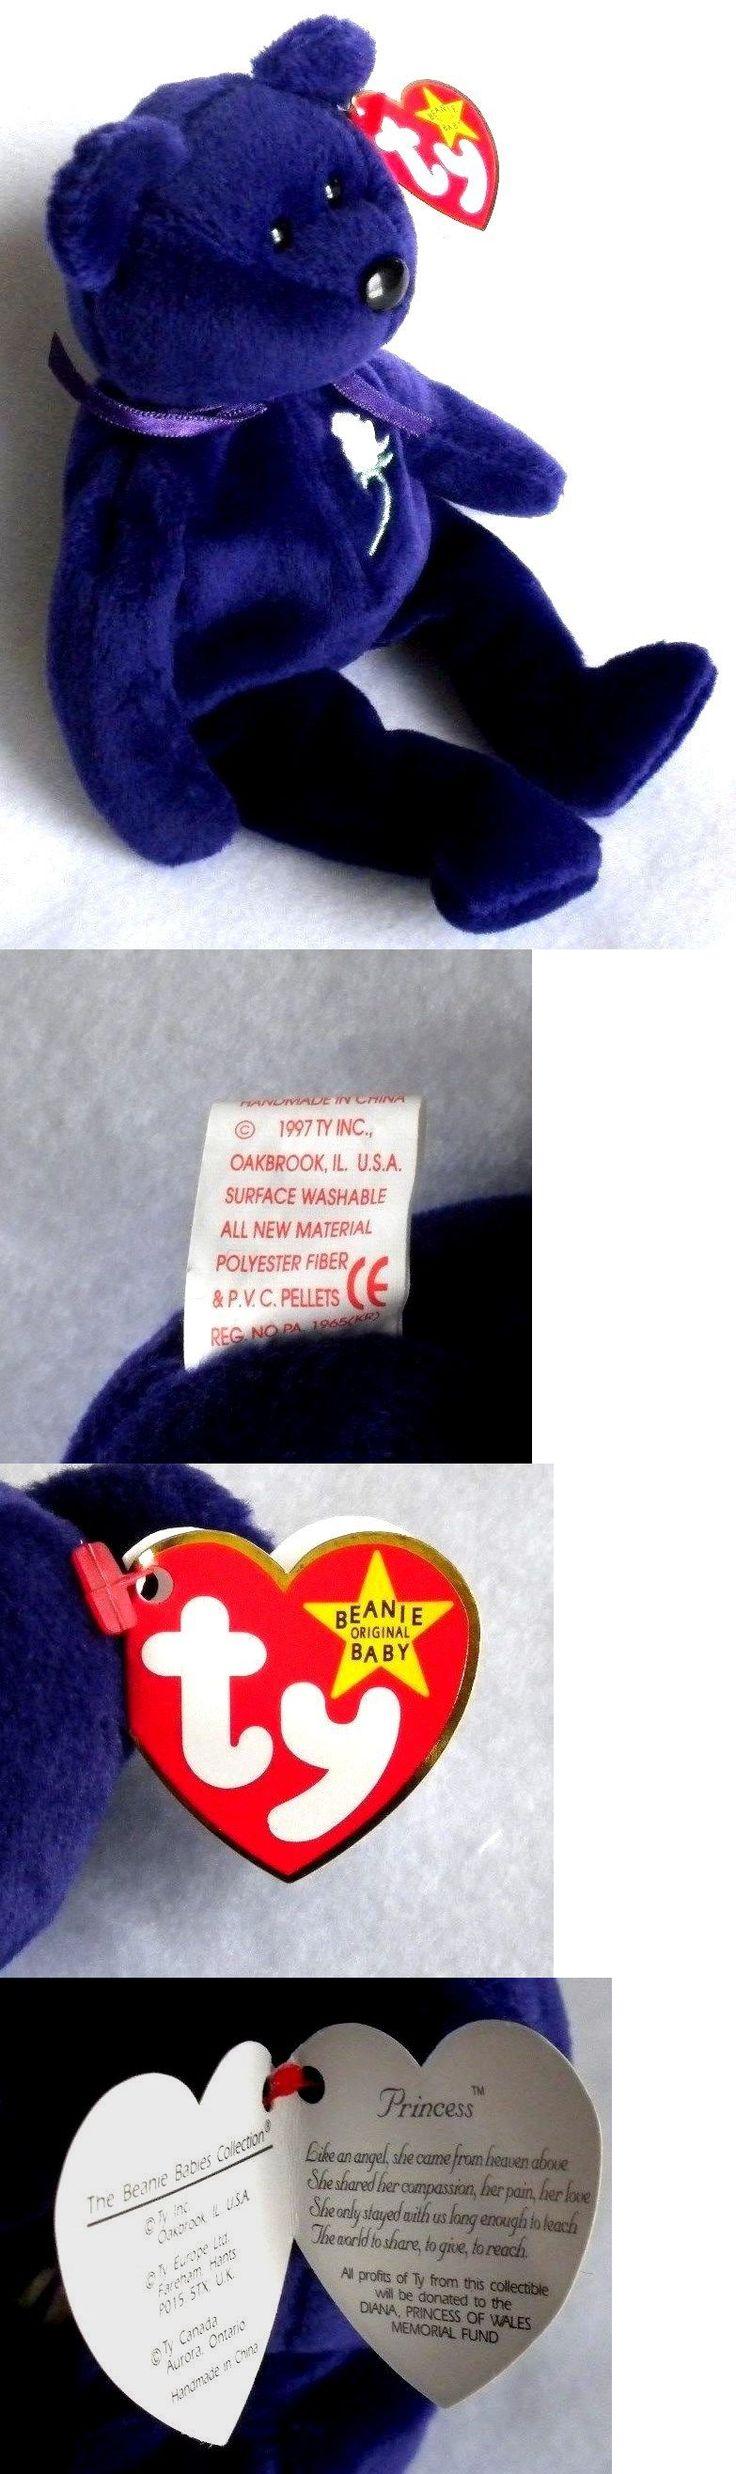 Basket Beanies 158681: Plush Royal Purple Princess Diana Beanie Baby Bear Pvc Pellets 1St Edition Mint -> BUY IT NOW ONLY: $2000 on eBay!